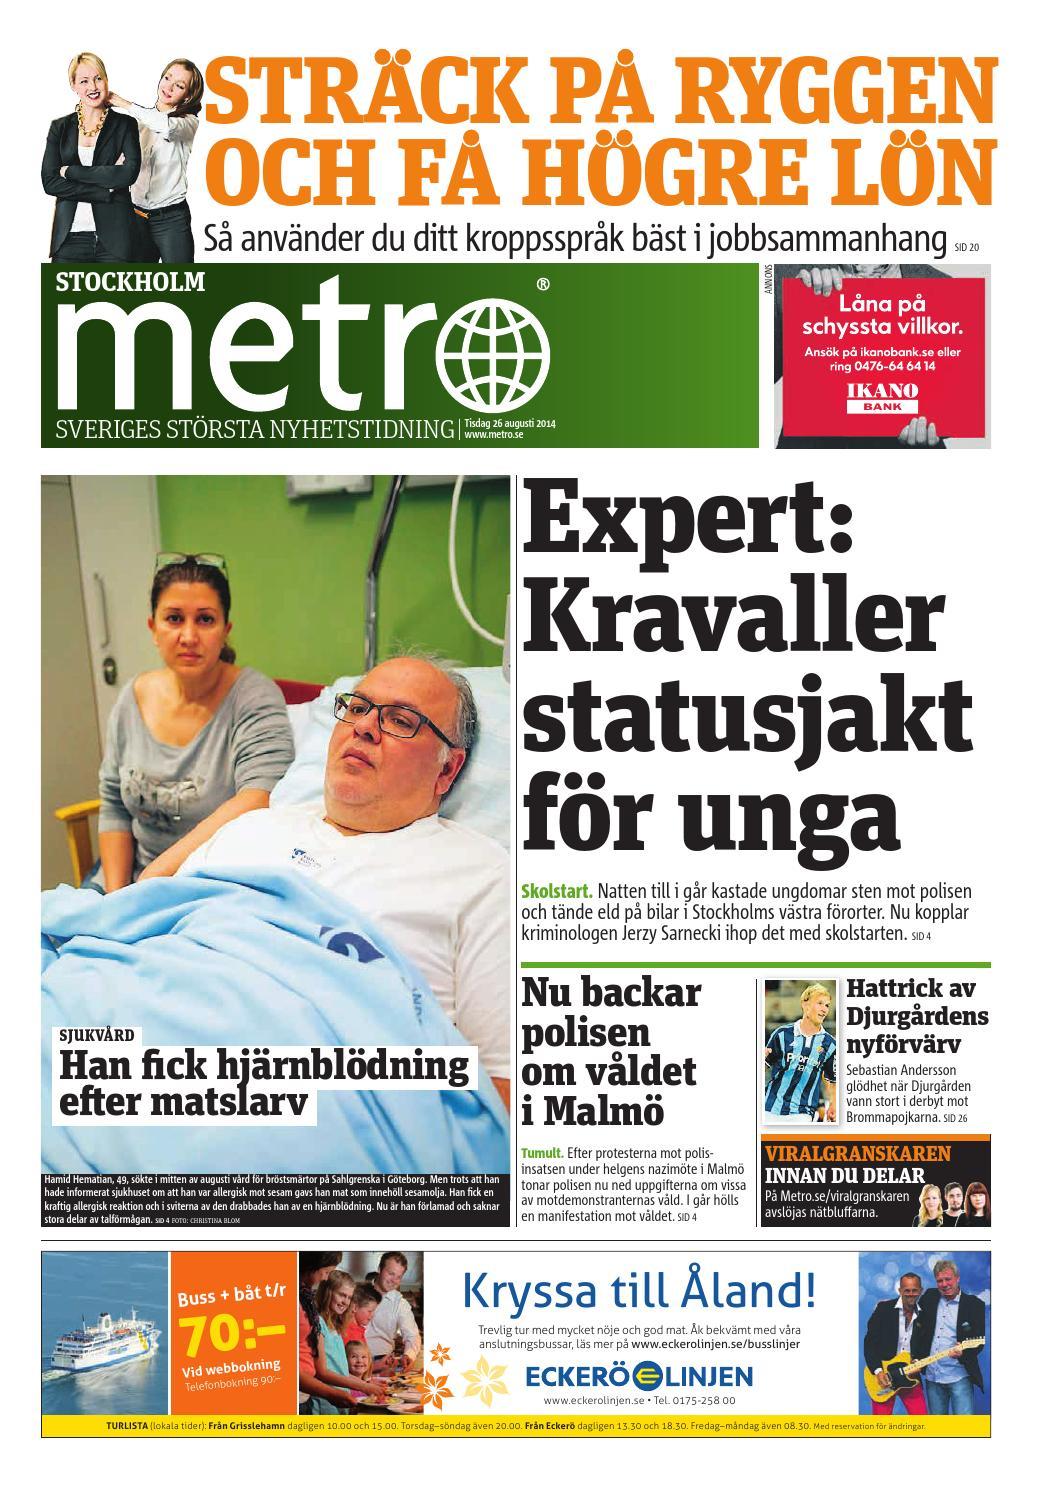 exekutiv skandinavisk dejting